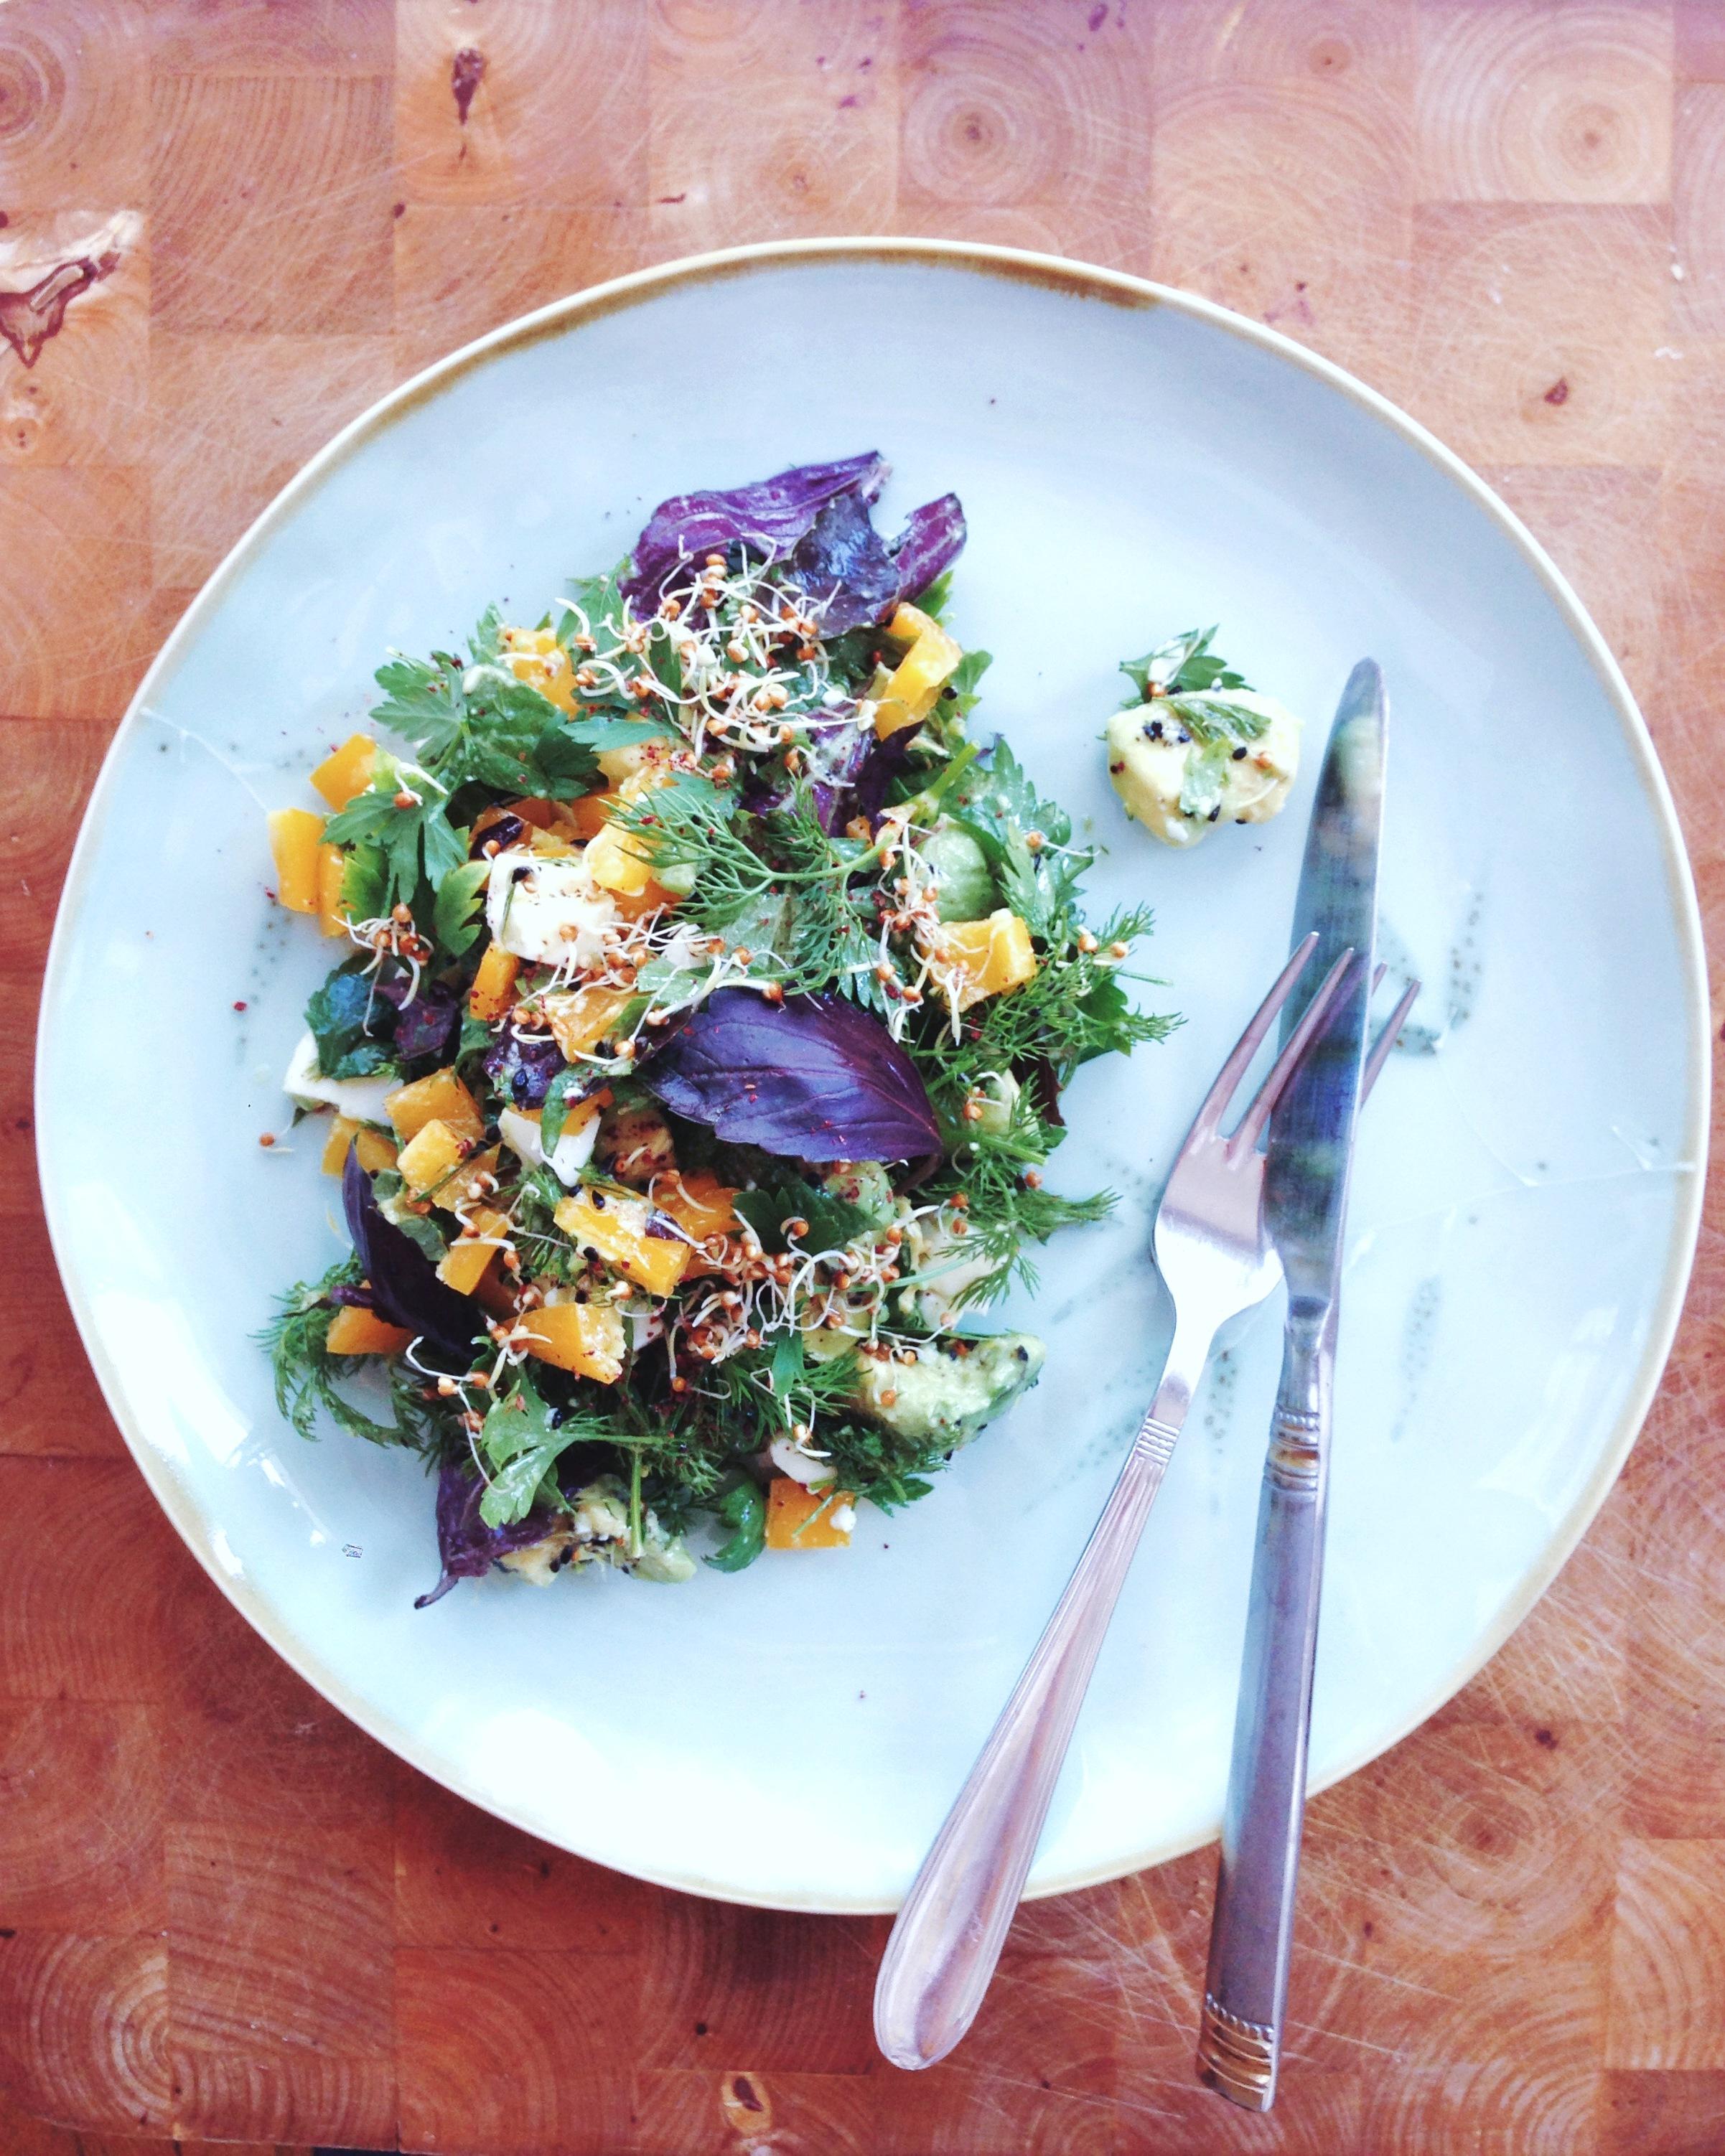 Rainbow Salad With Herbs Galore